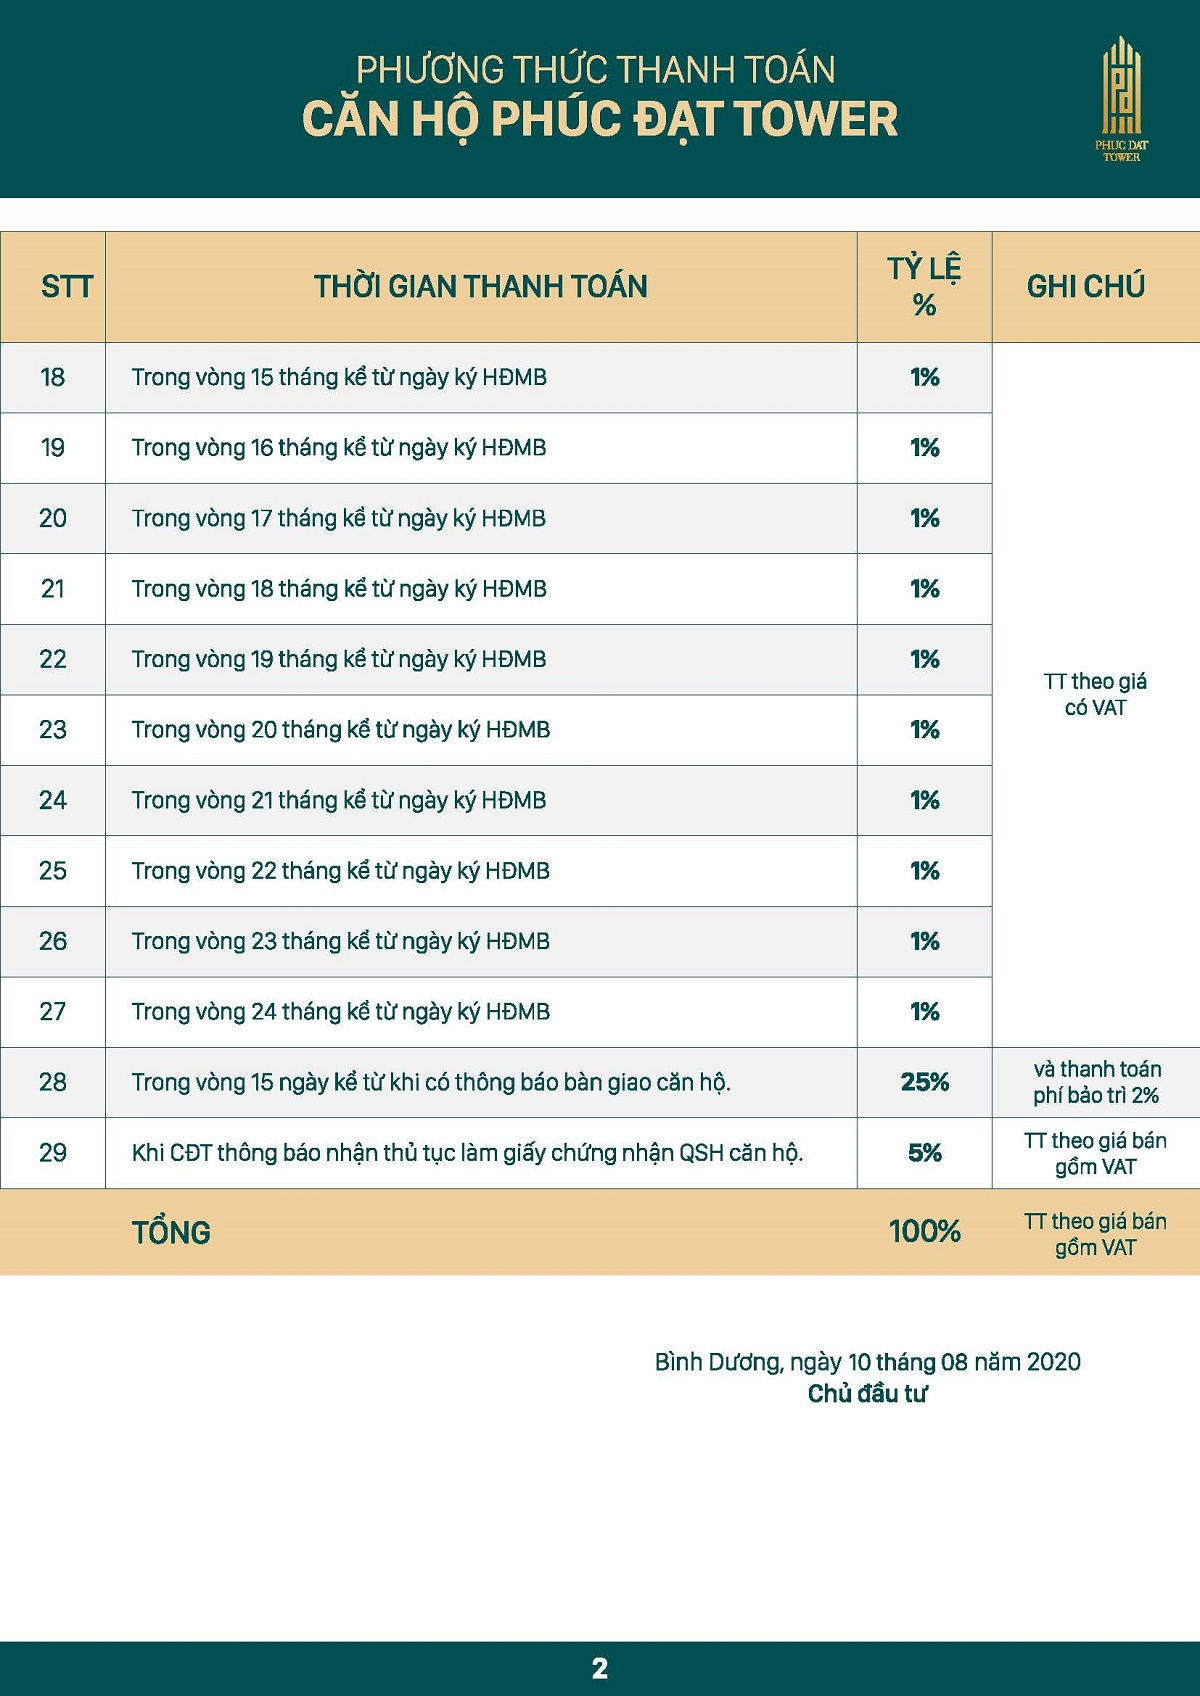 phuong-thuc-thanh-toan-trang-2